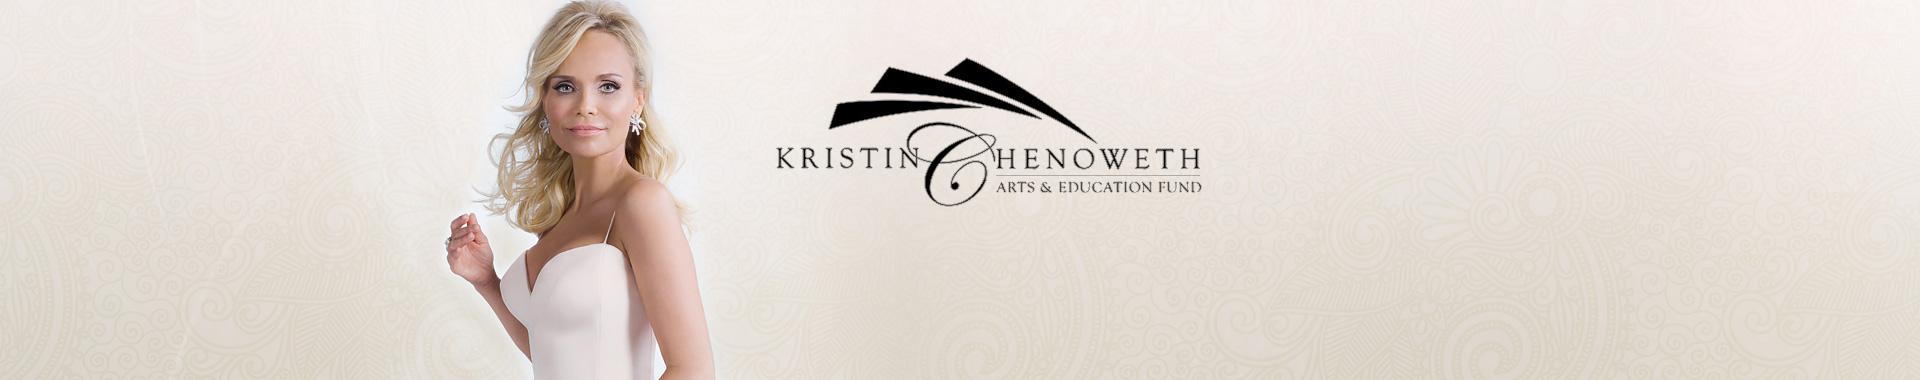 4Good | Kristin Chenoweth